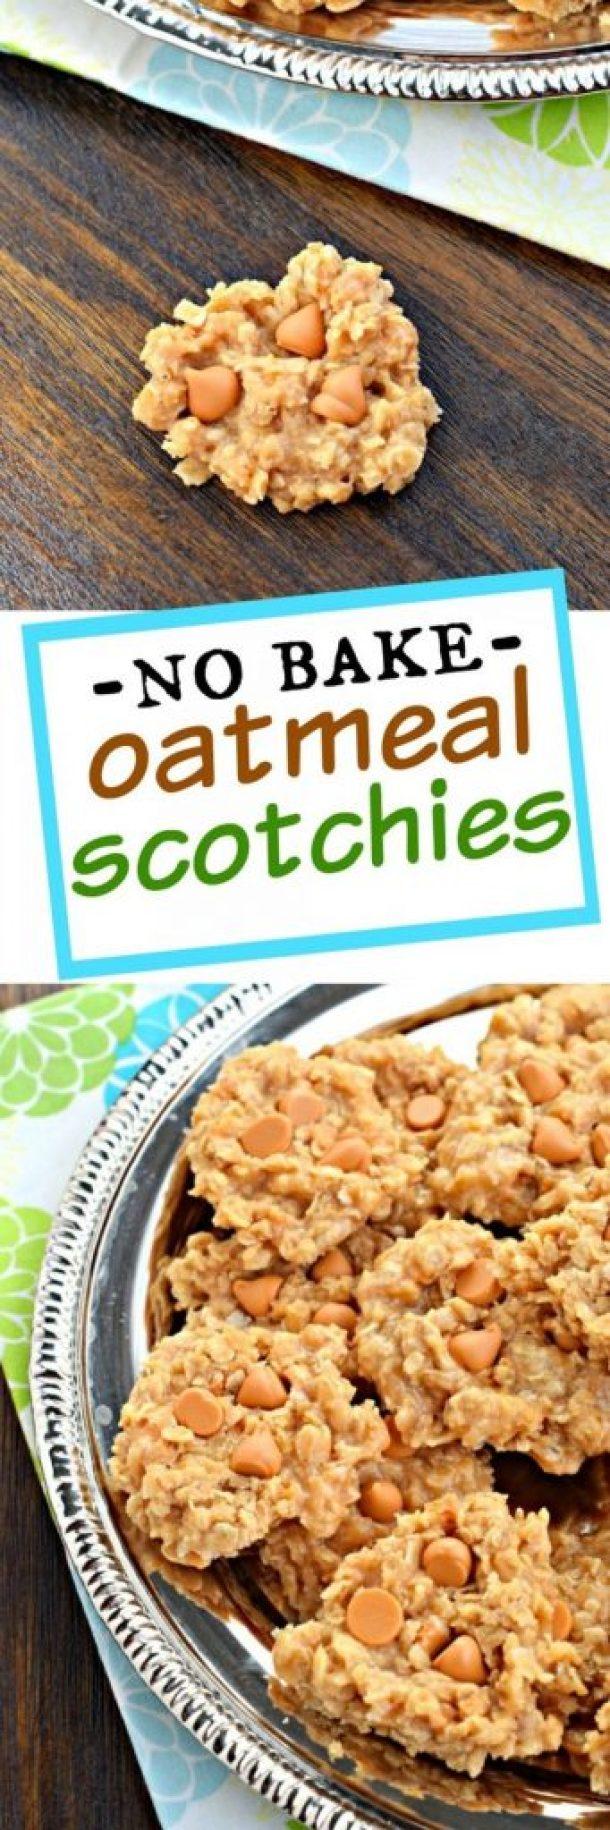 No Bake Cookies Recipes - No Bake Oatmeal Scotchies Recipe via Shugary Sweets